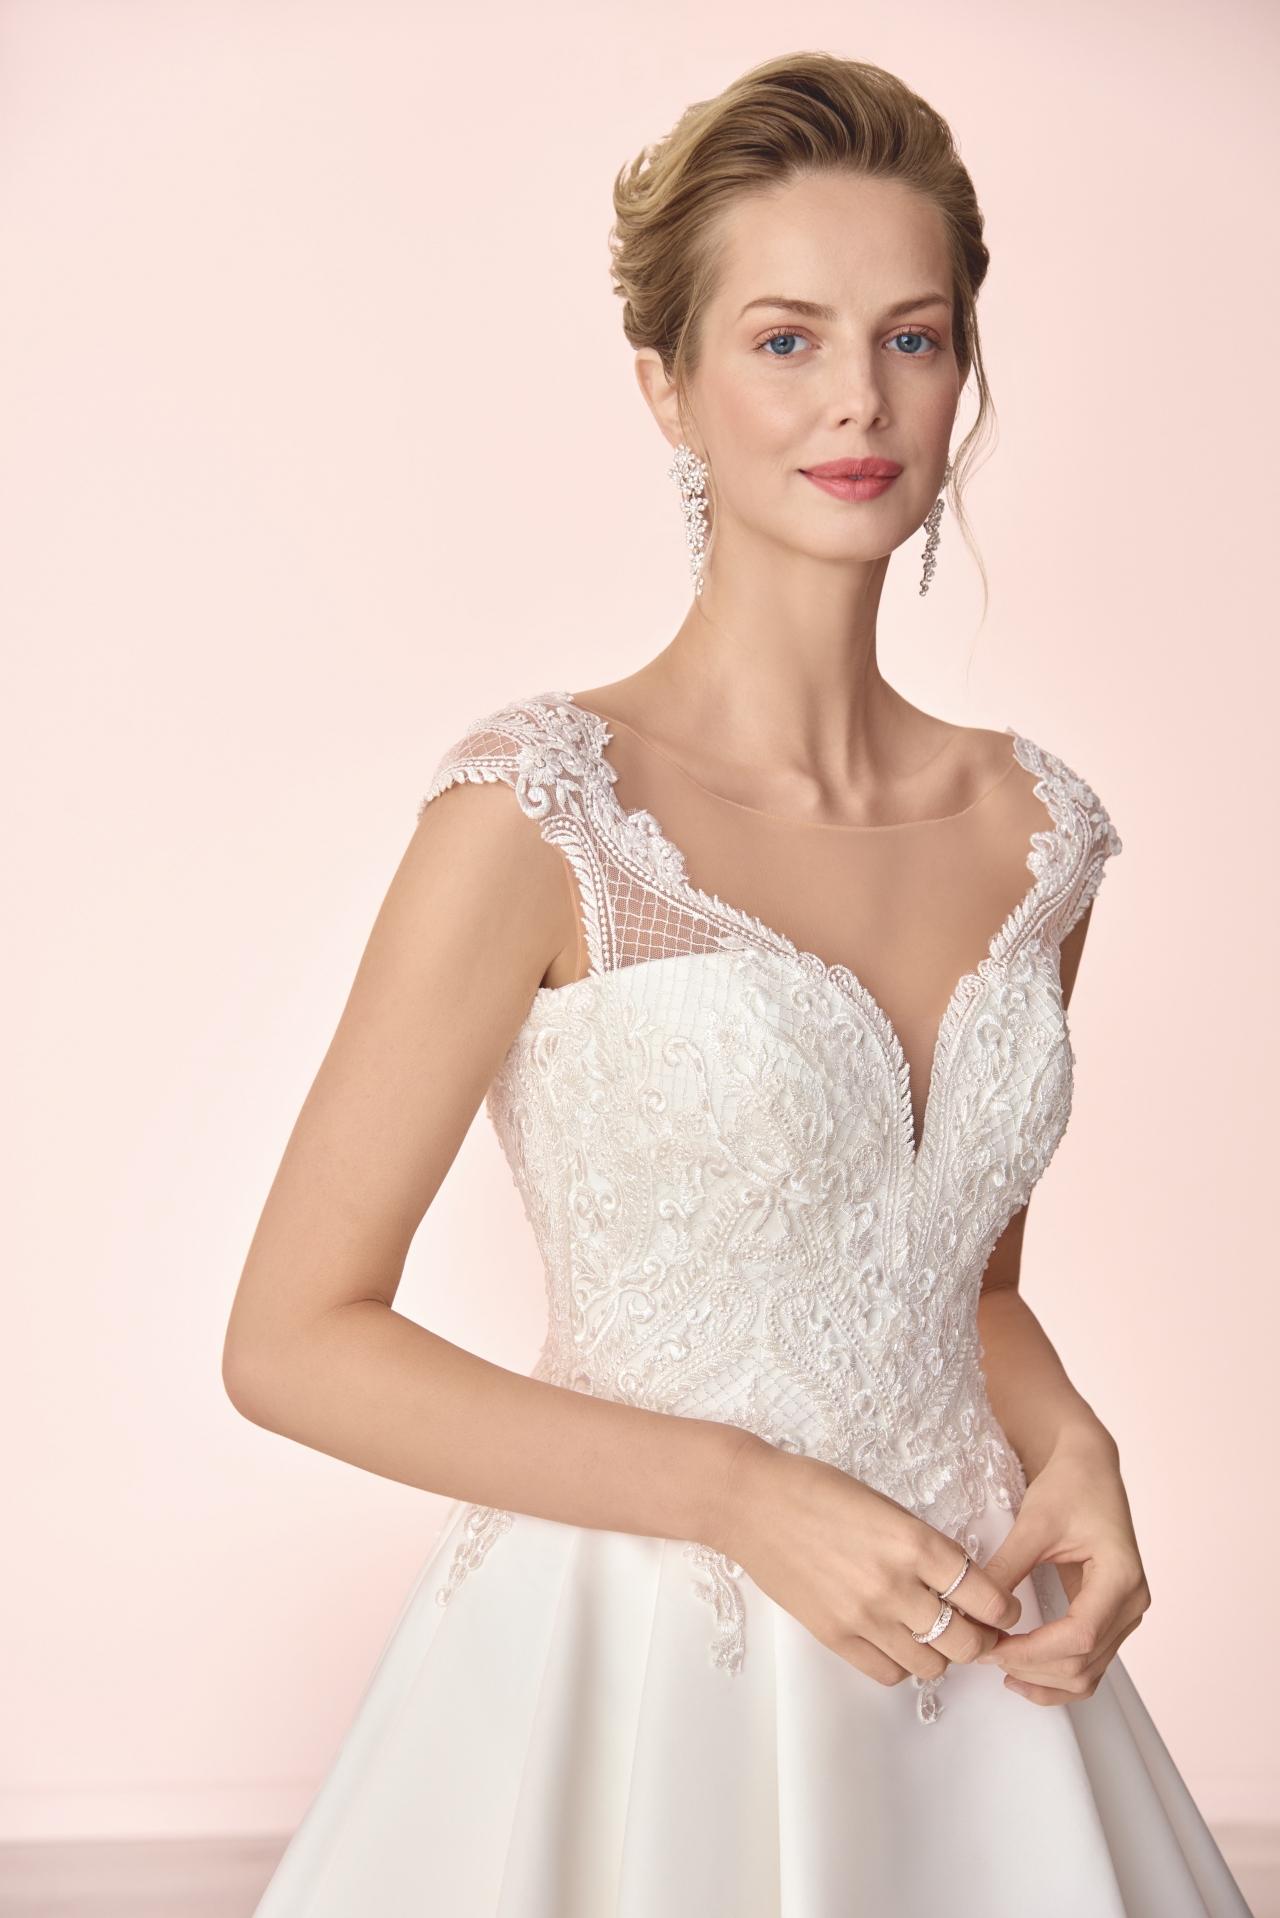 Brautkleid Elizabeth Konin 2019 - 4105T-0